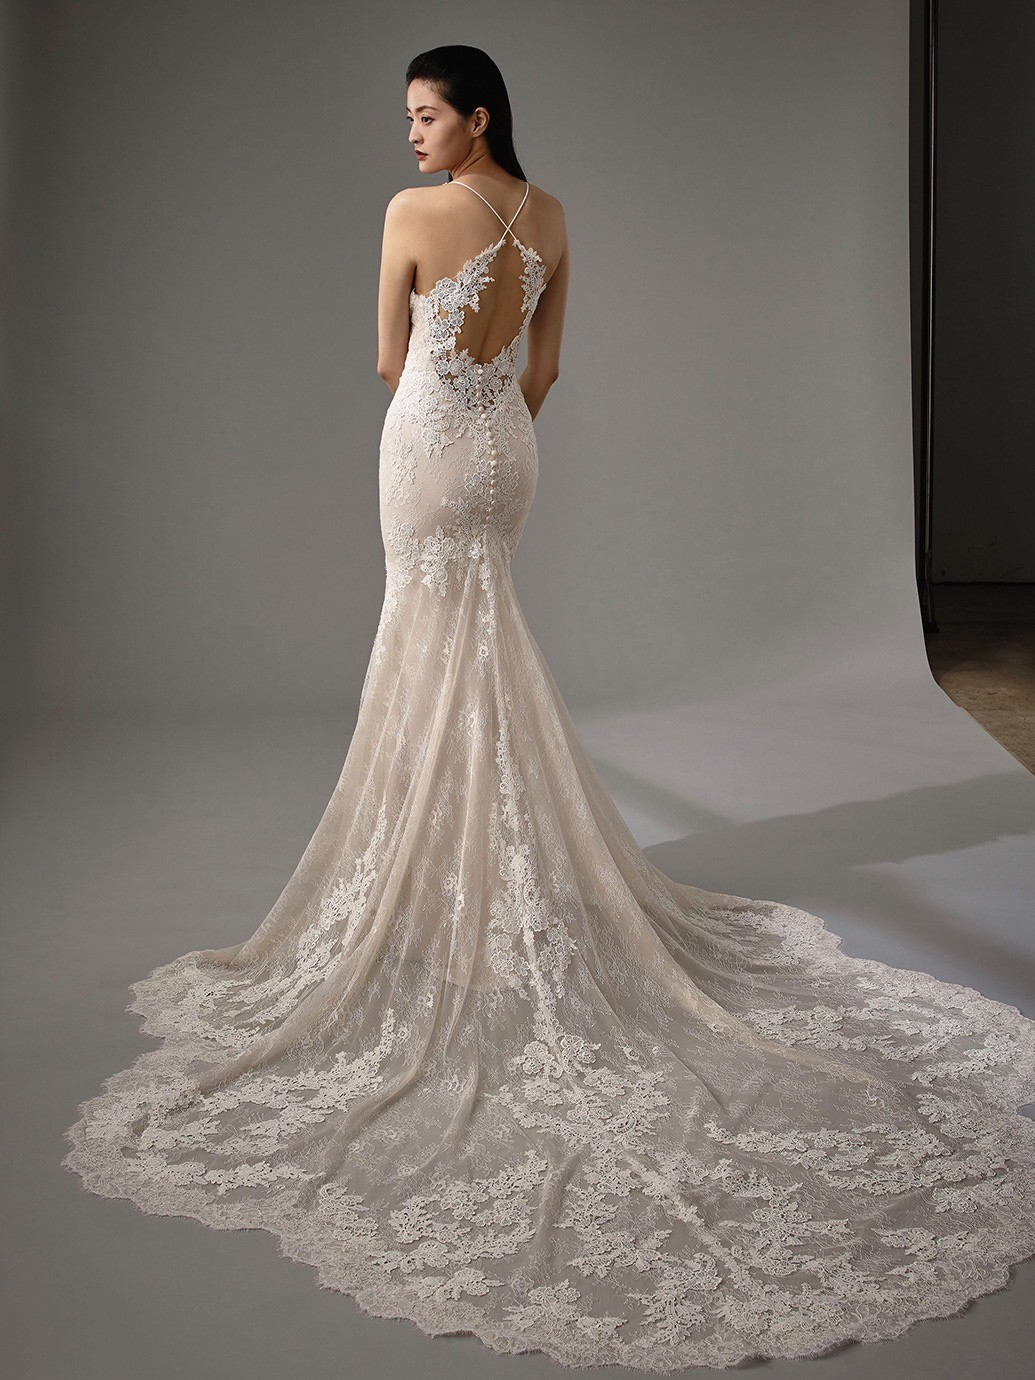 Brautkleid Modell Miller aus der Blue by Enzoani Kollektion 2020